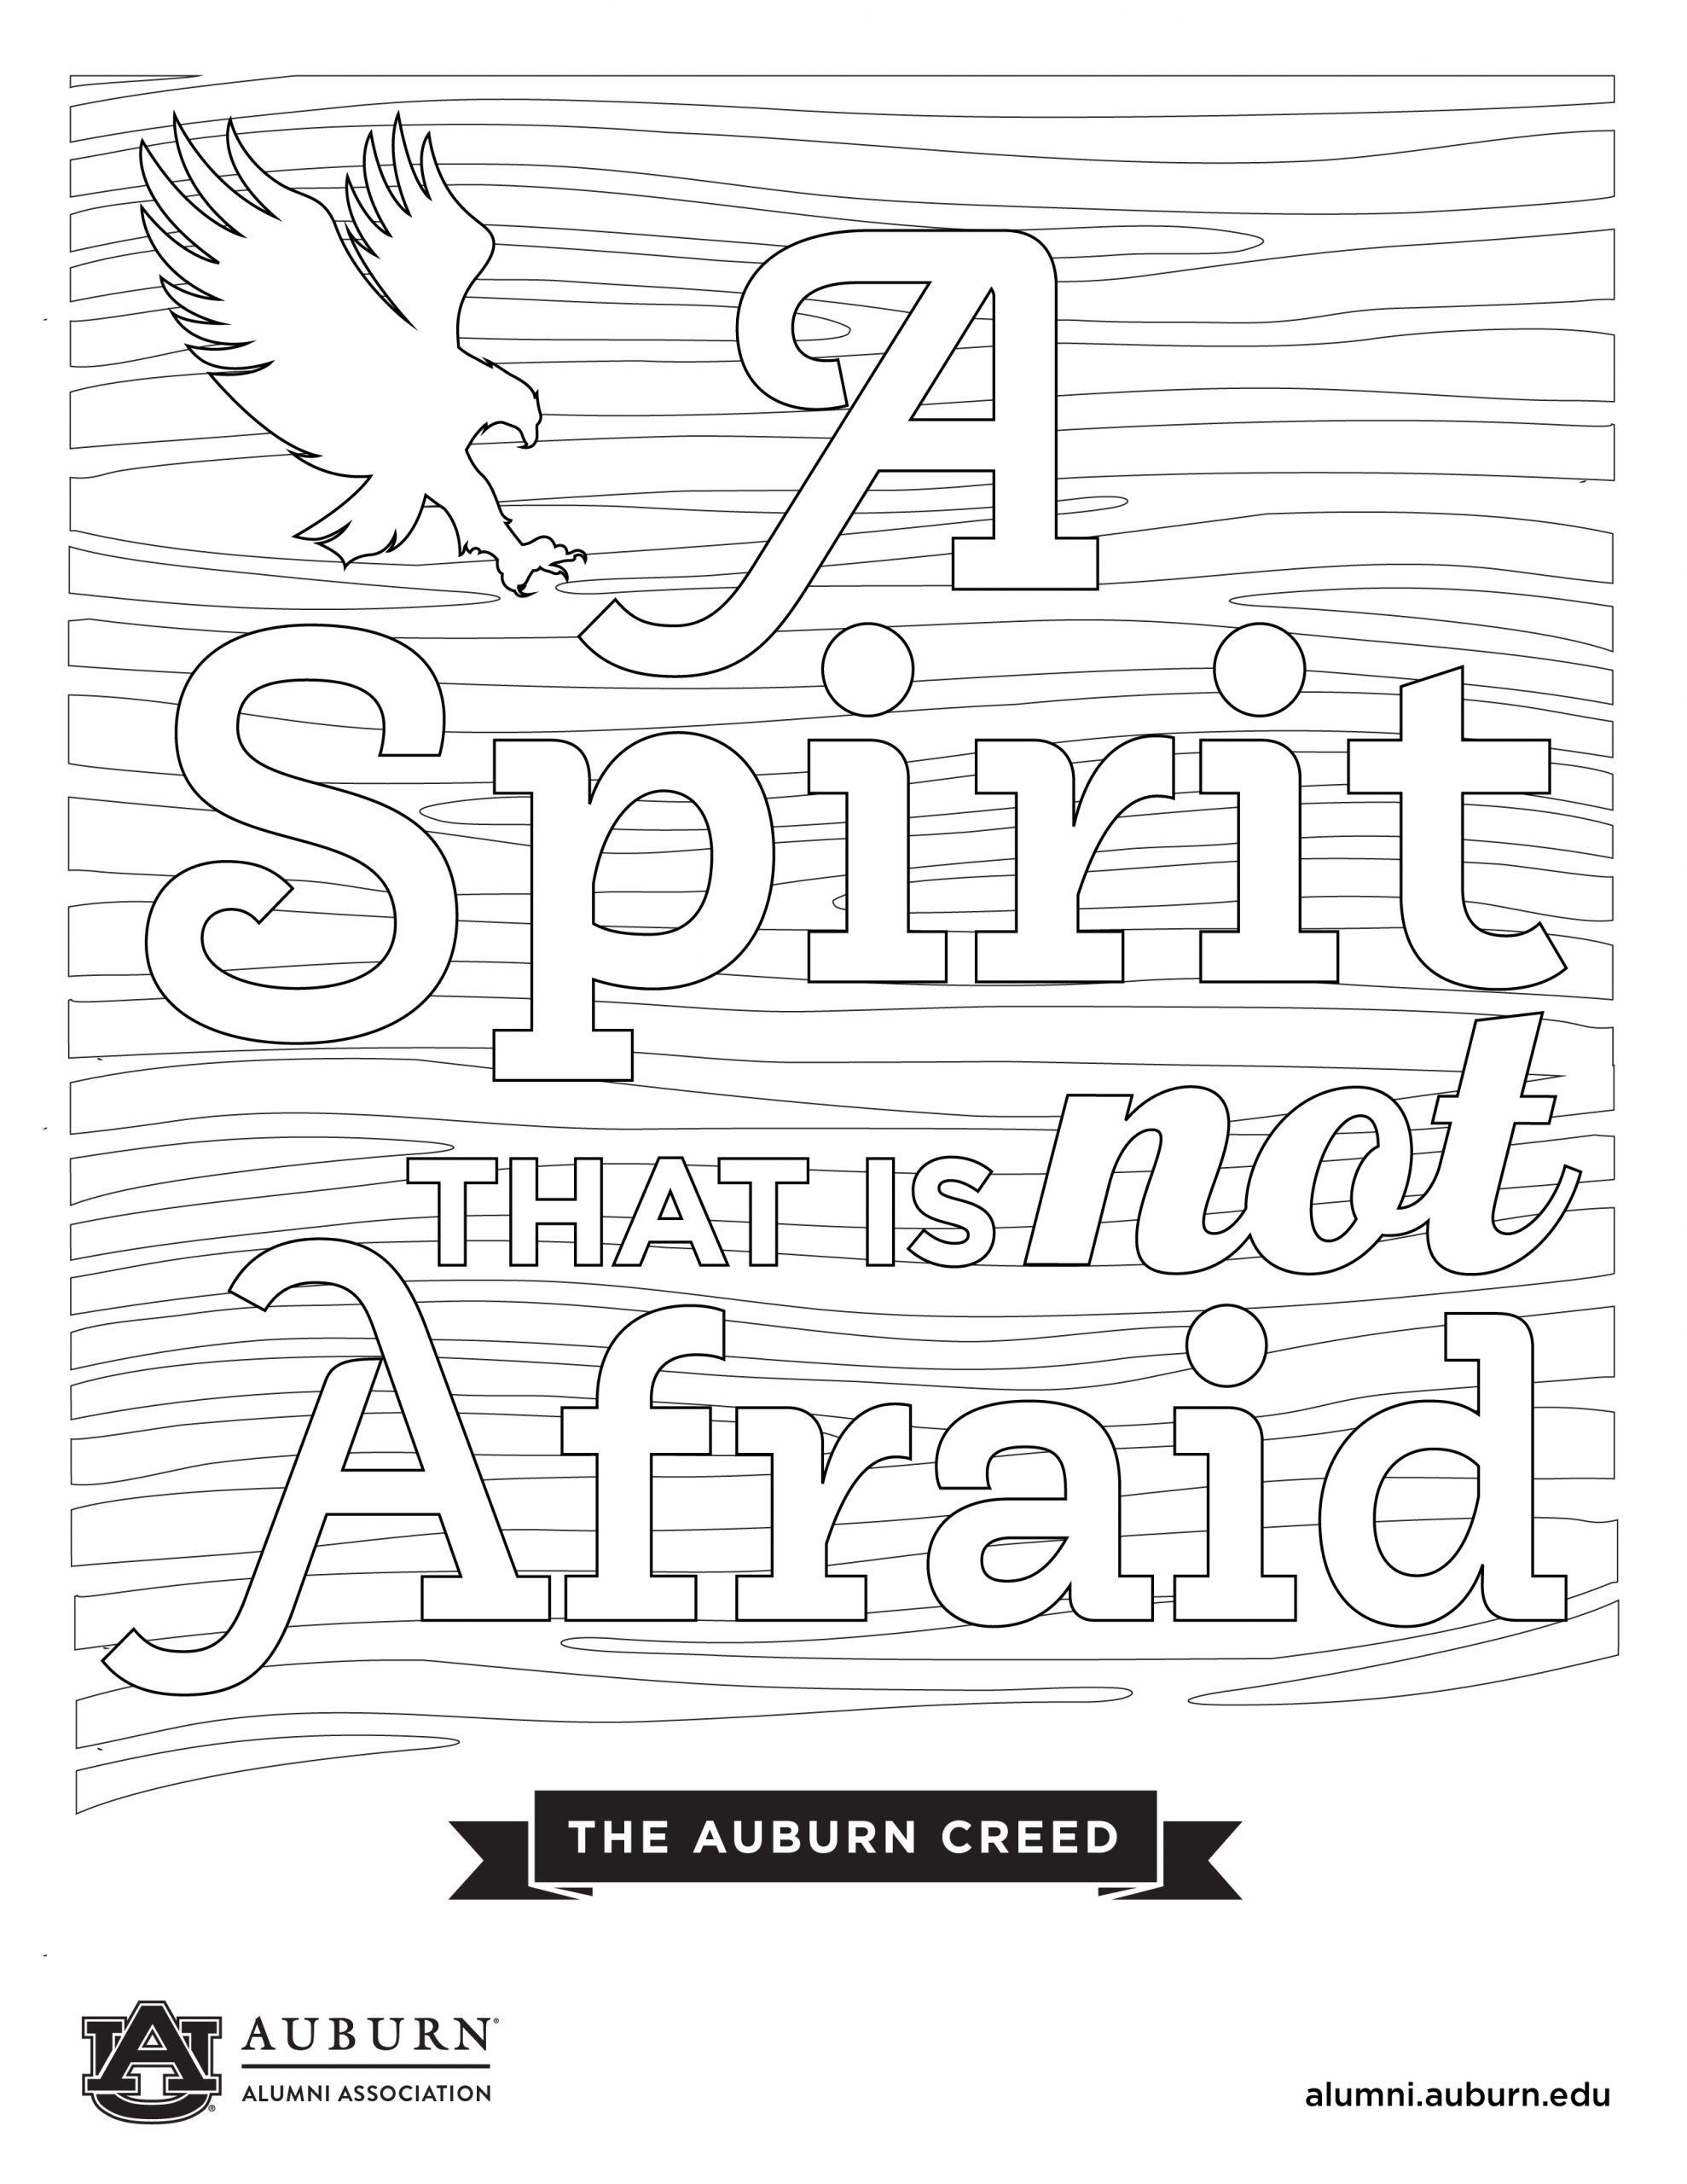 A Spirit is not afraid coloring sheet